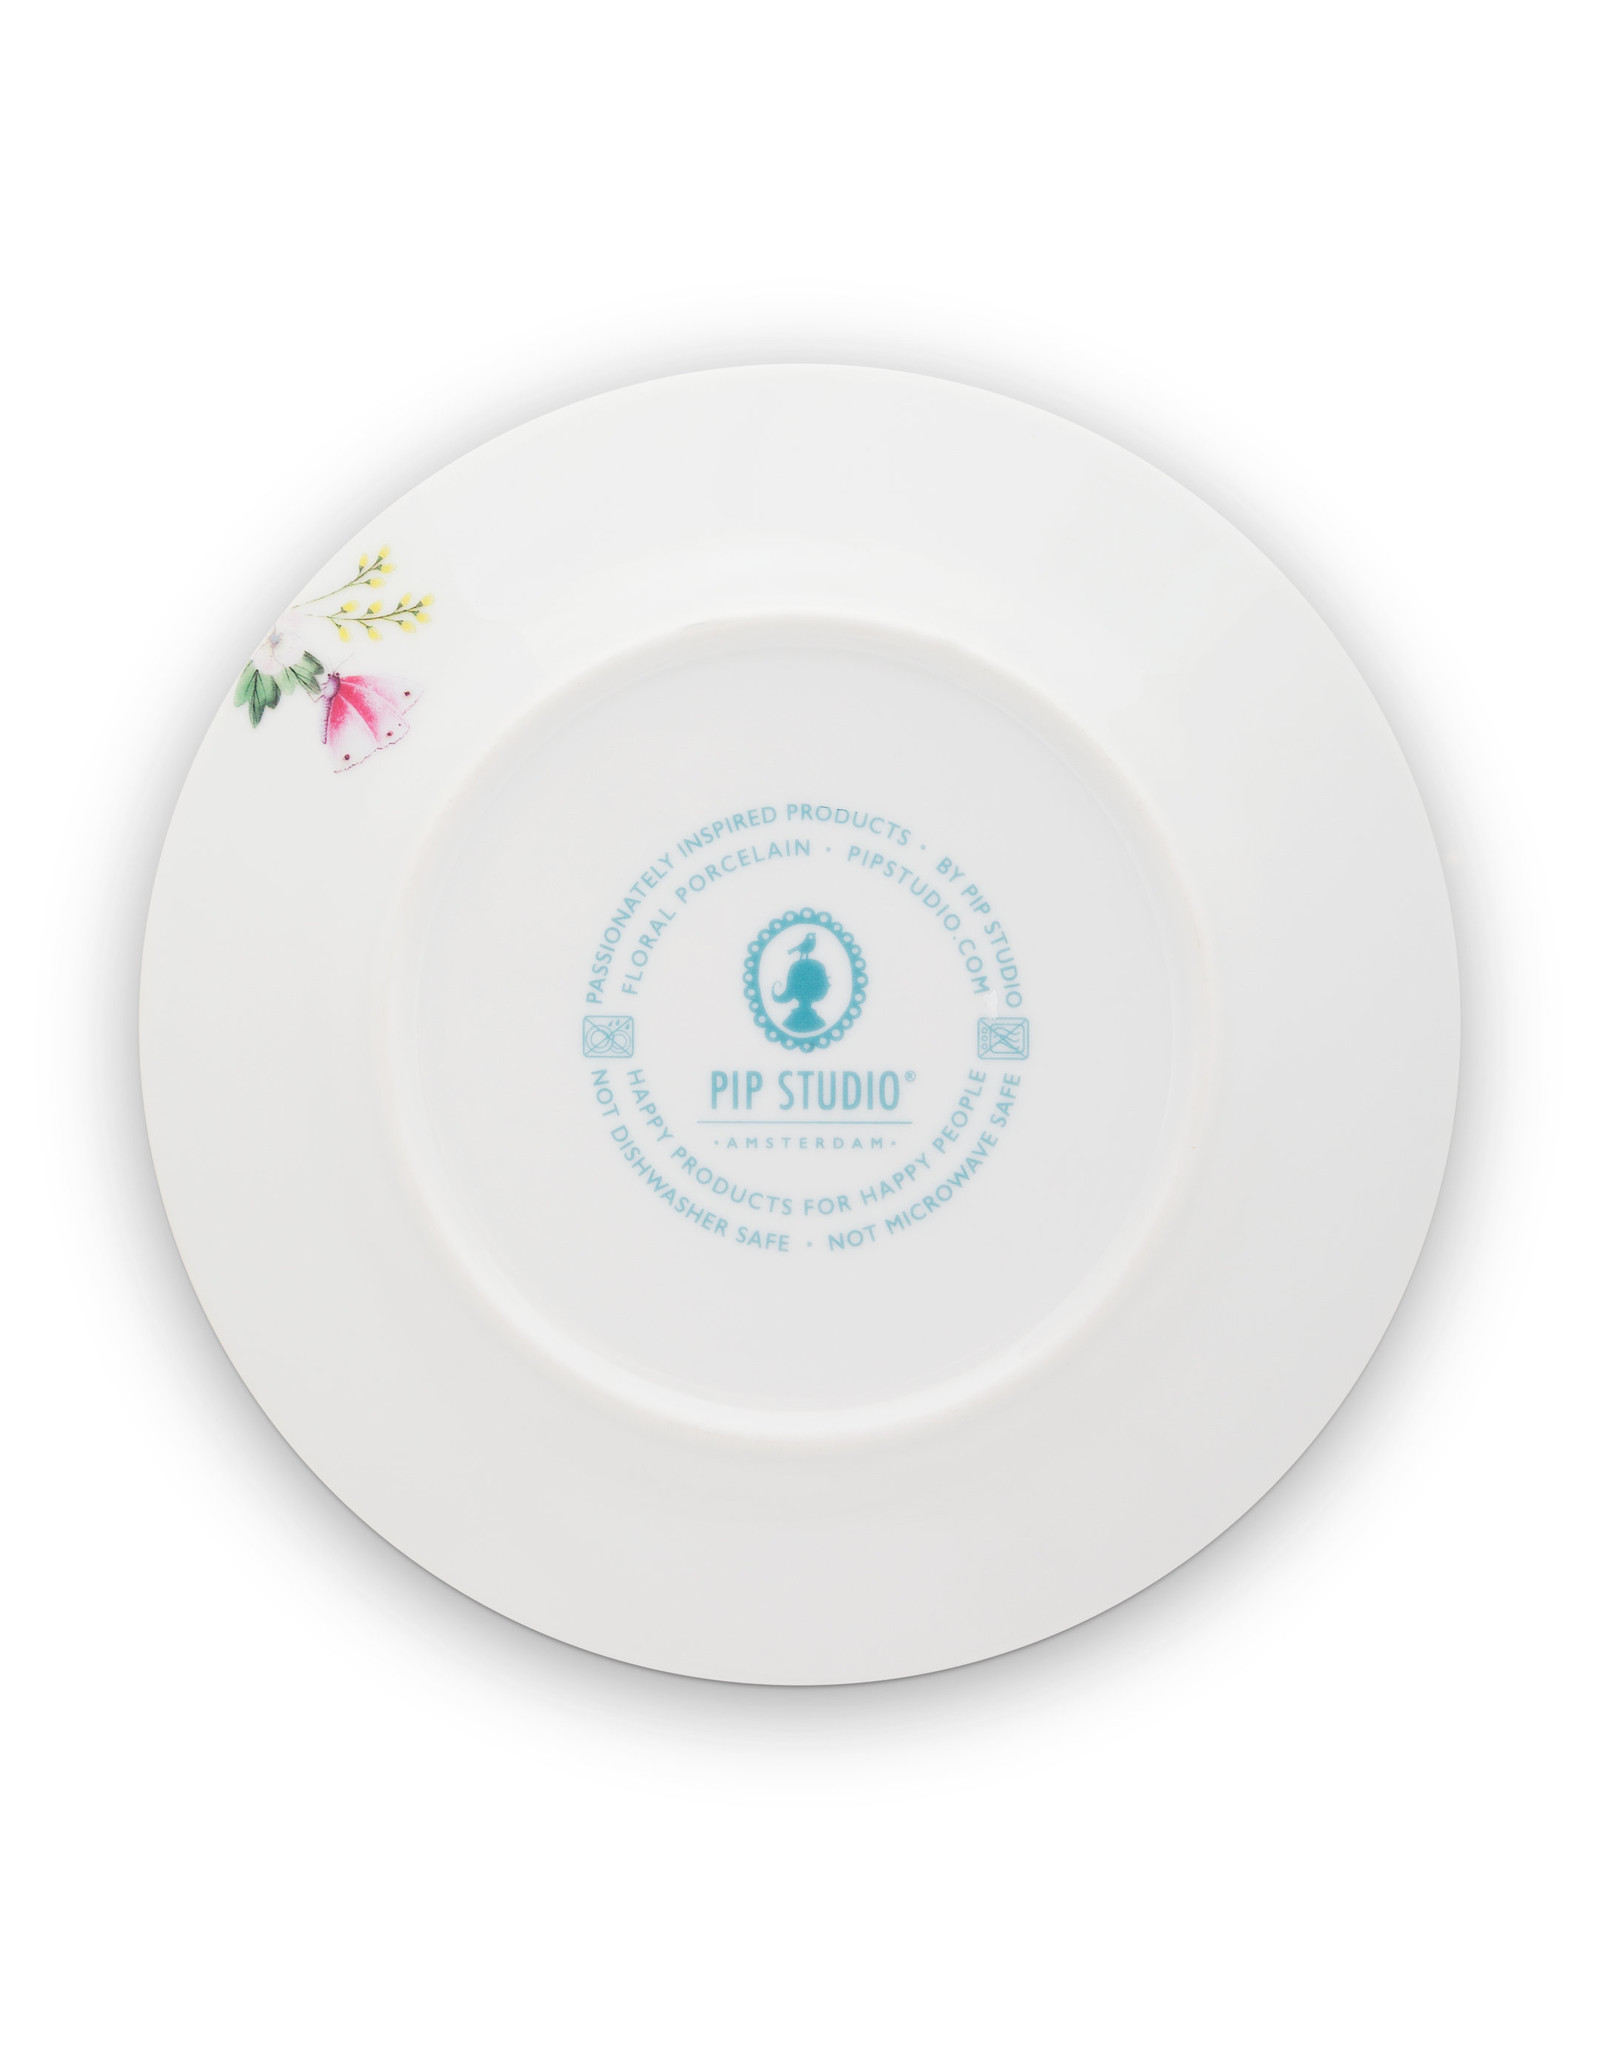 pip studio Plate Blushing Birds Blue 21cm